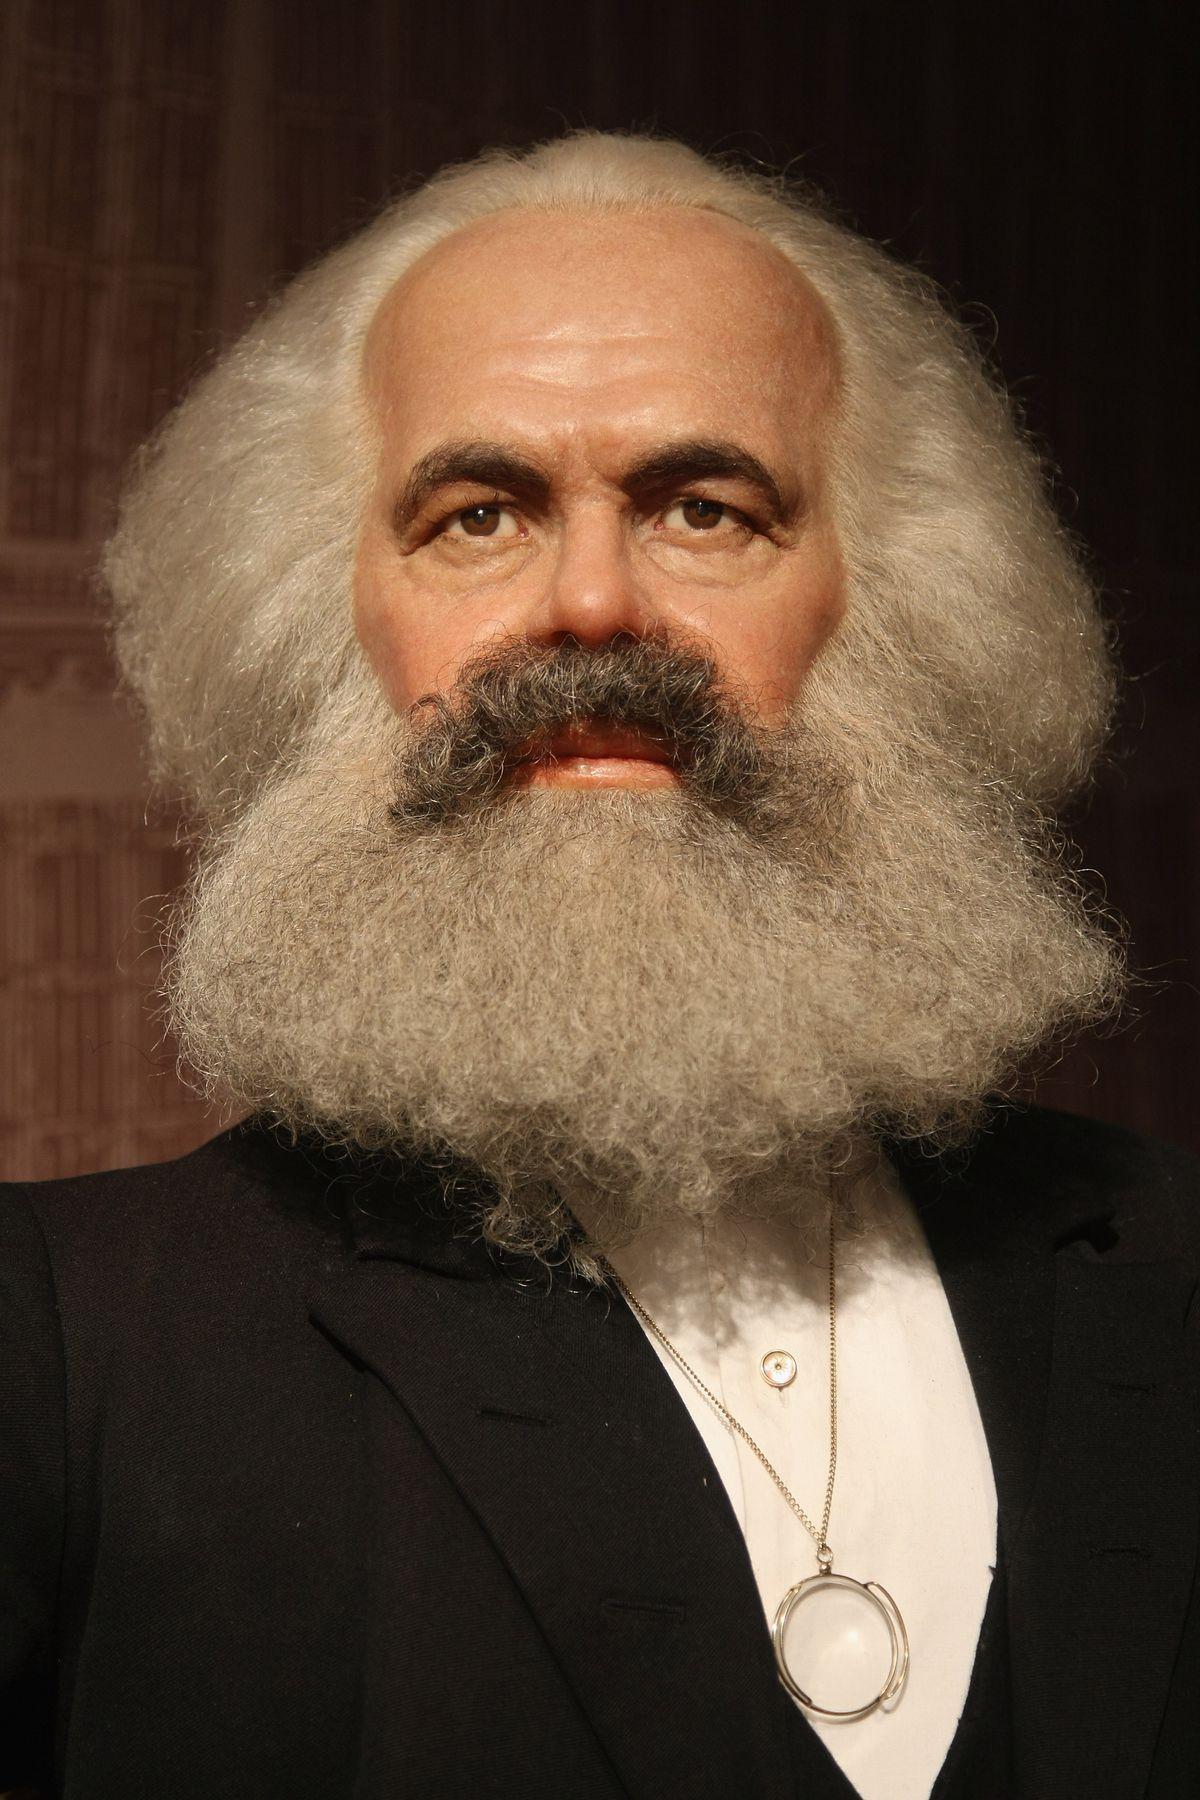 Karl Marx Wax Figure at Madame Tussauds